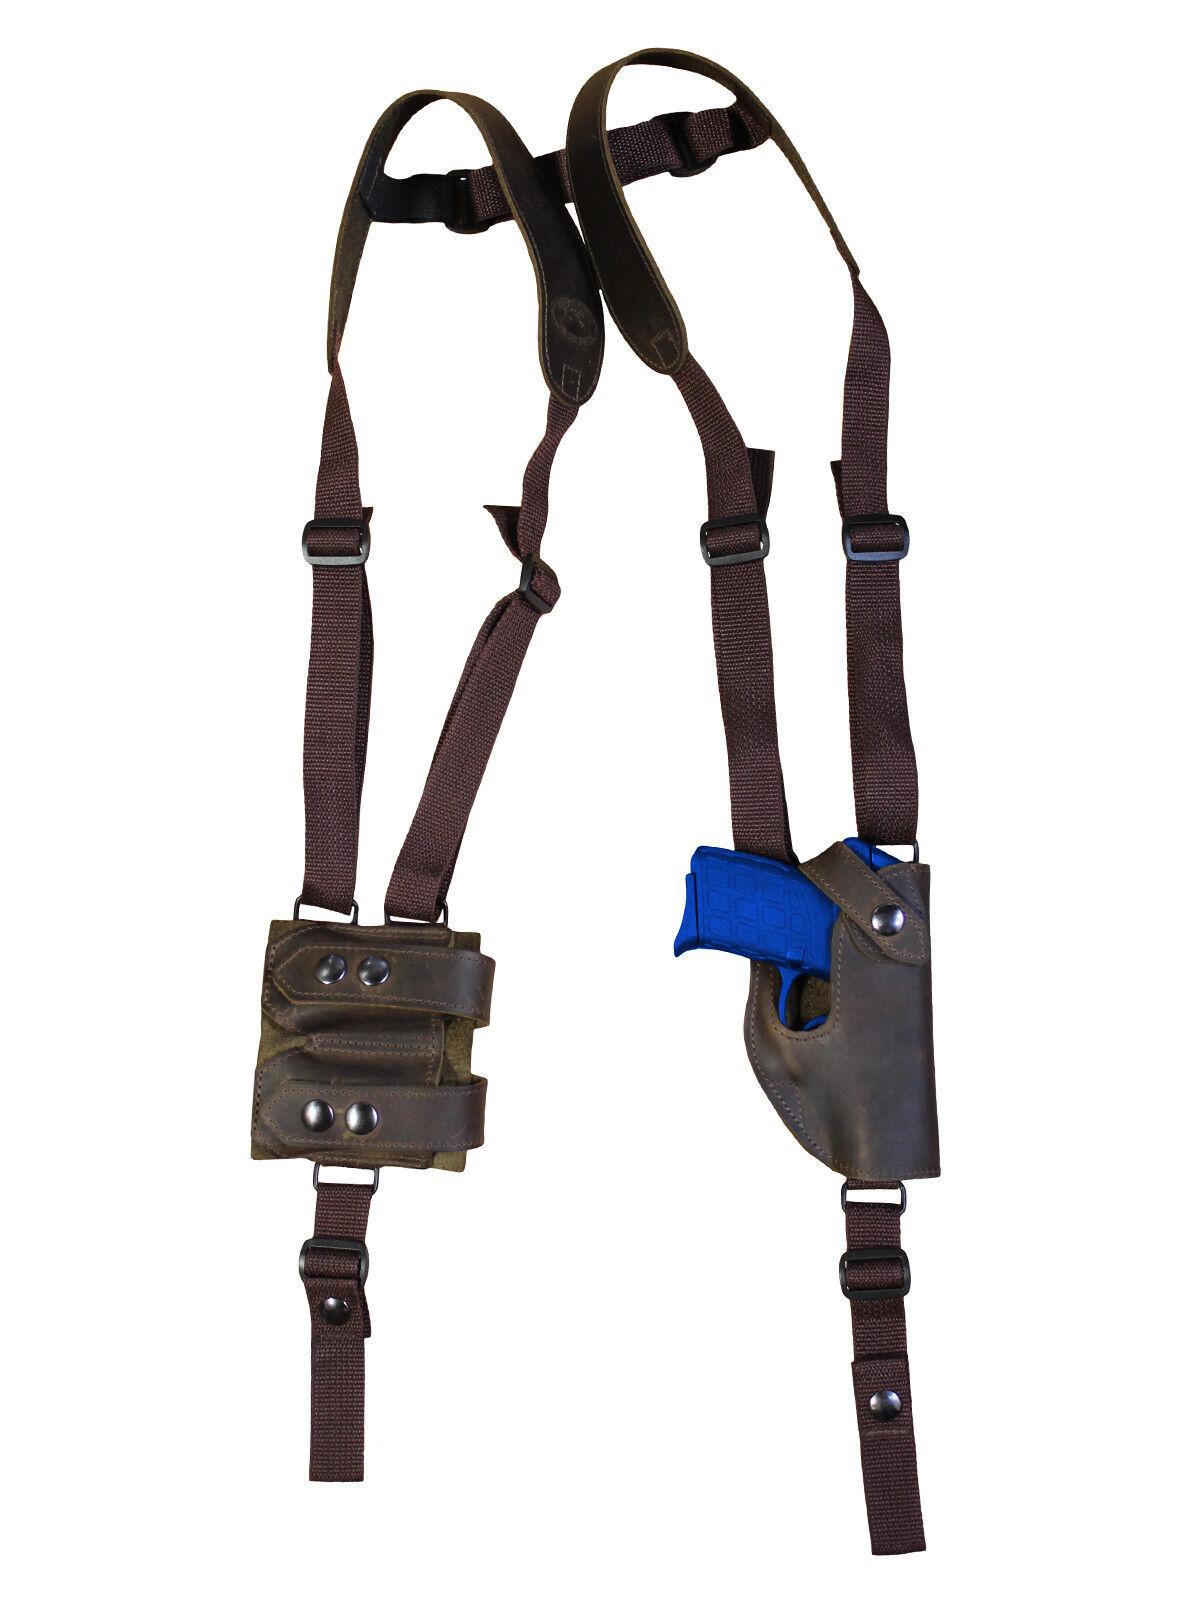 Nueva Funda Barsony marrón cuero hombro bolsa del Mag Ruger Kimber UltraComp 9 40